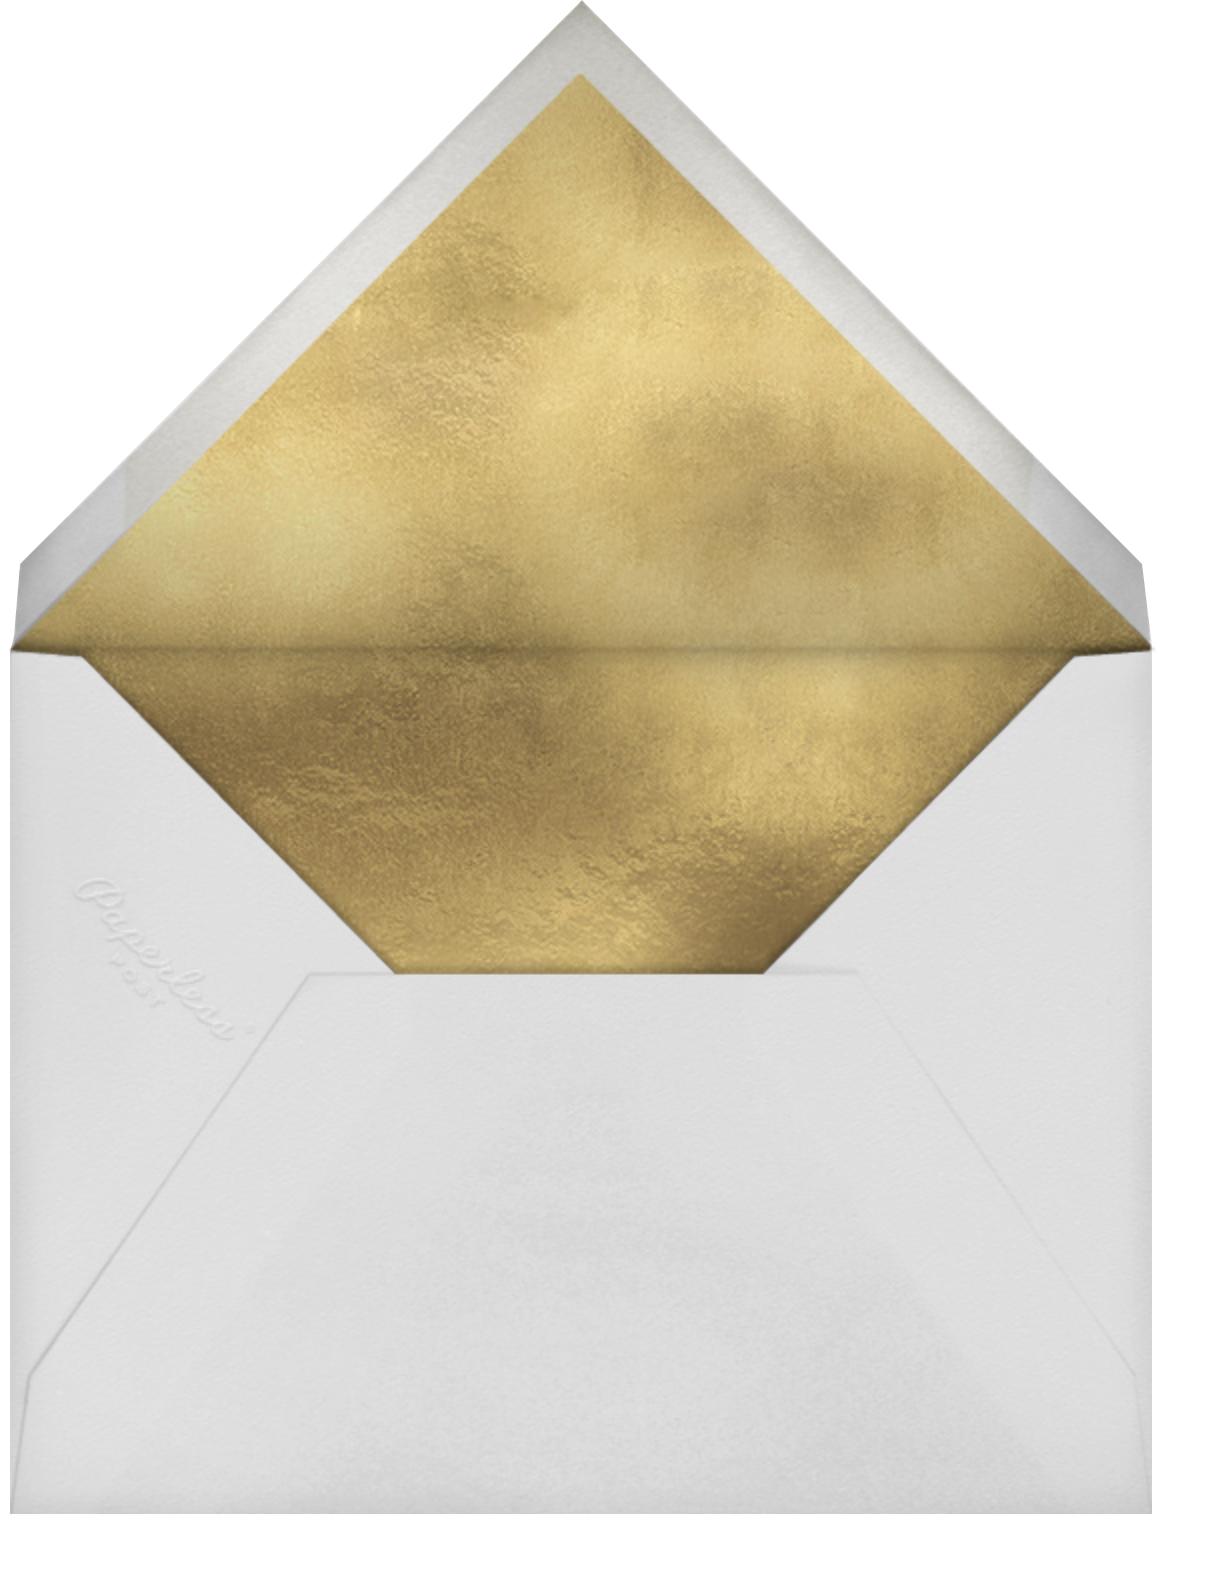 Partridge Photo - Rifle Paper Co. - Envelope